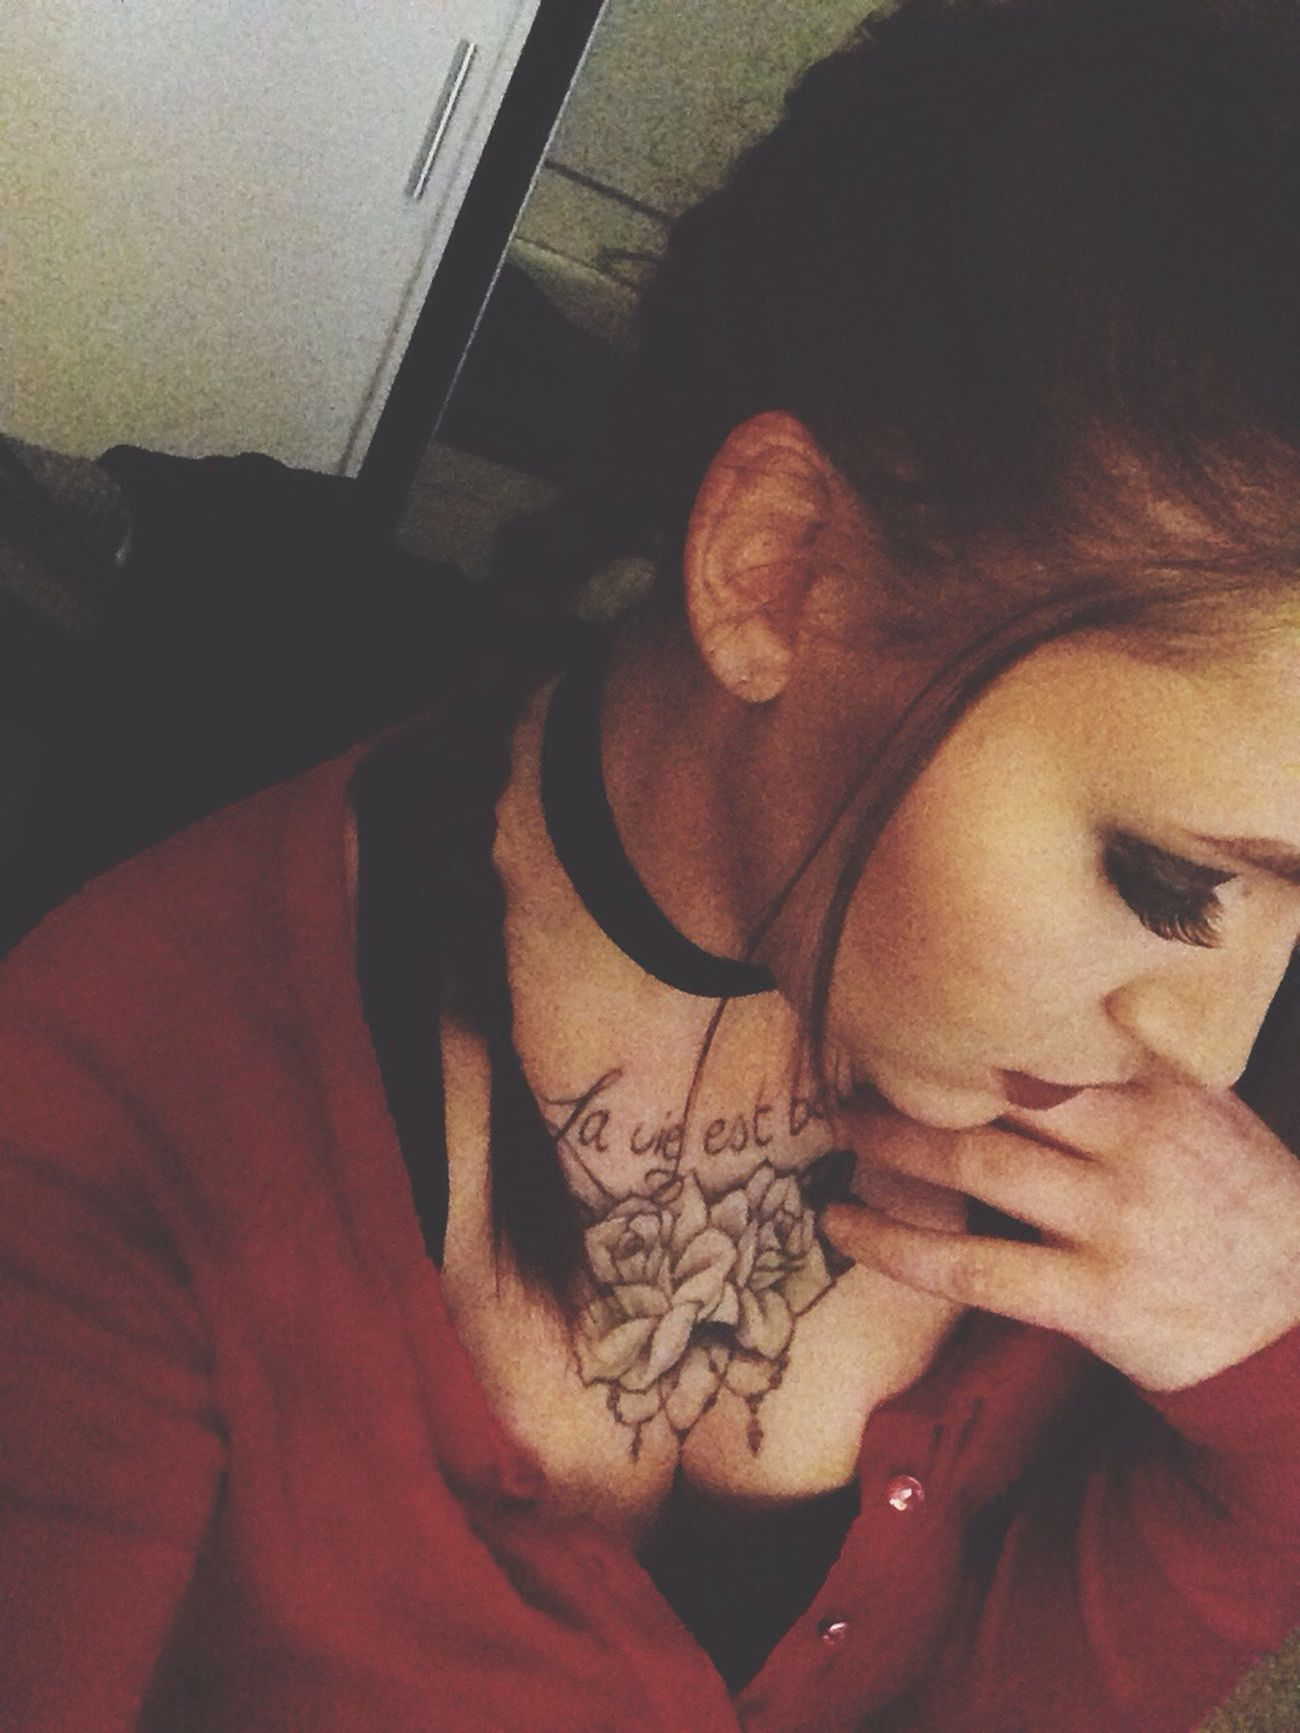 Braided Hair Real People Indoors  Women Young Women Choker Tattoo Inkedgirls